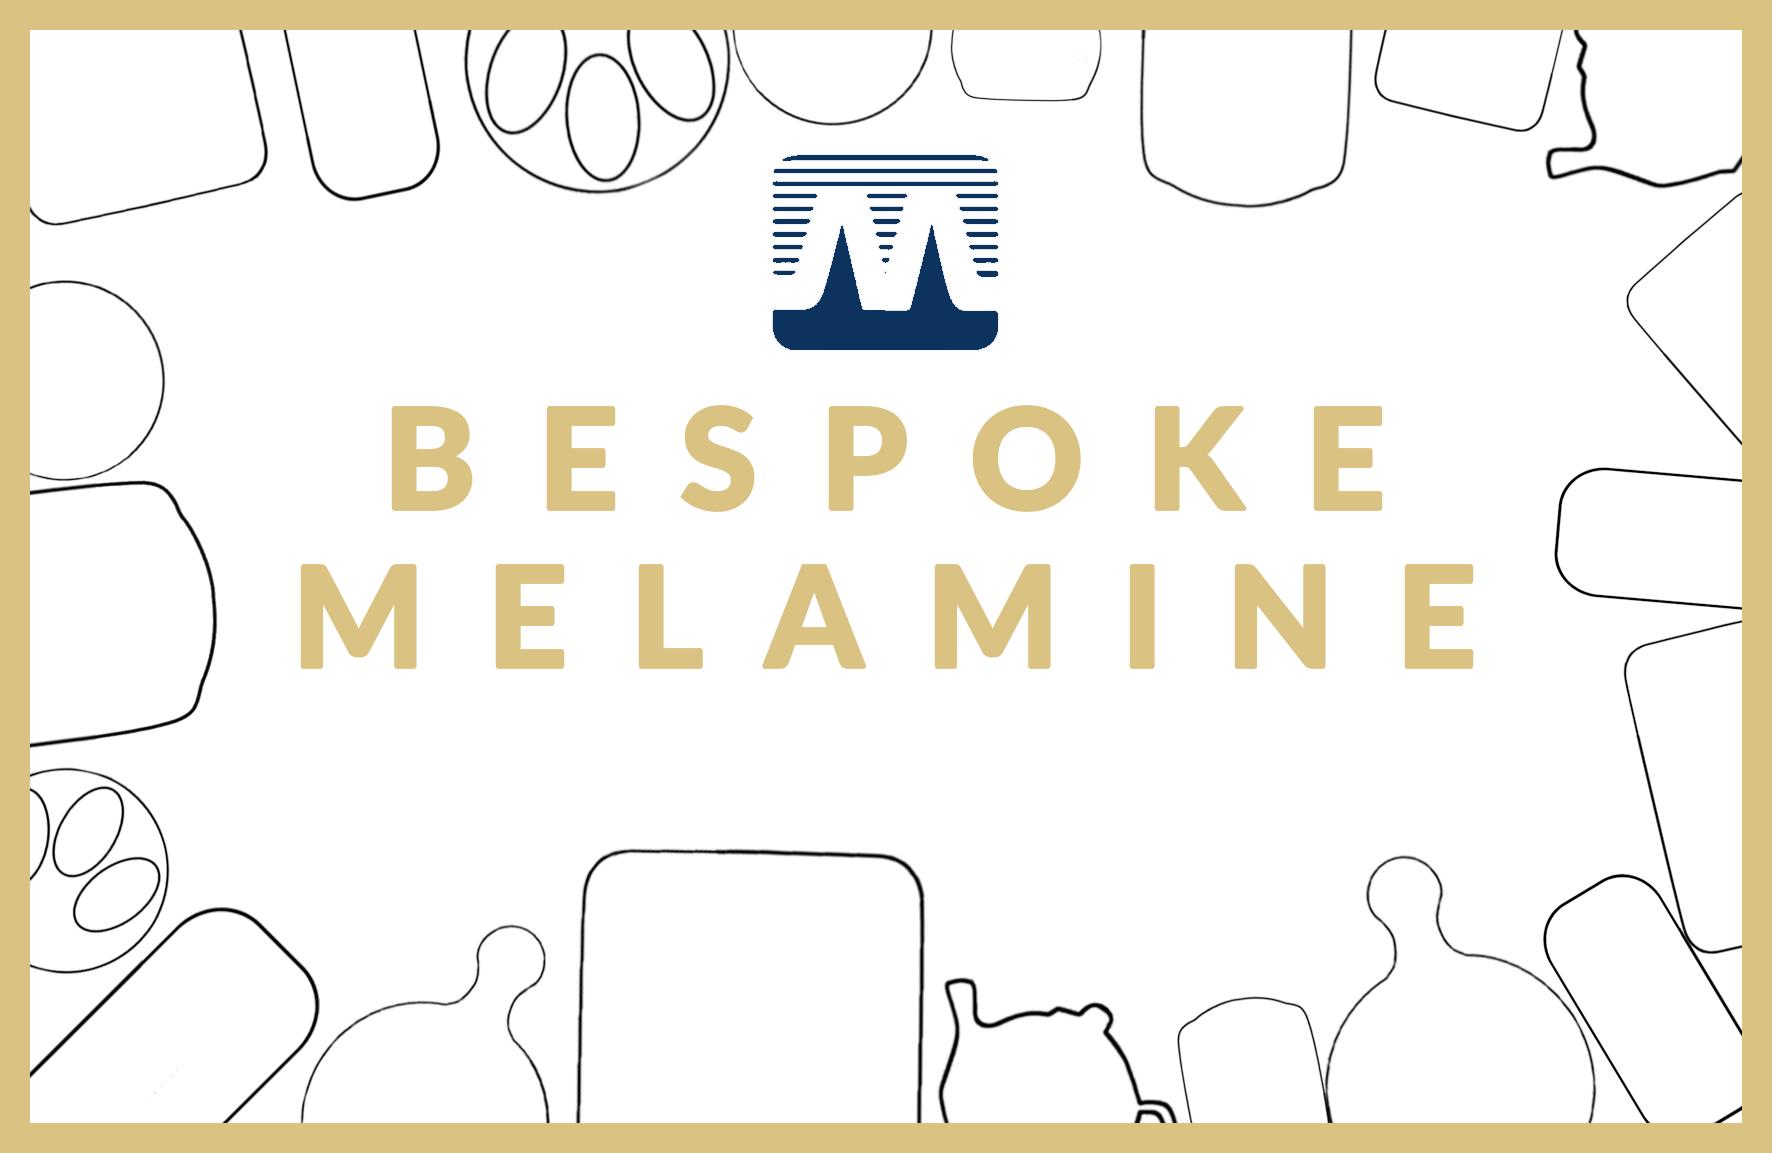 bespoke melamine homeware